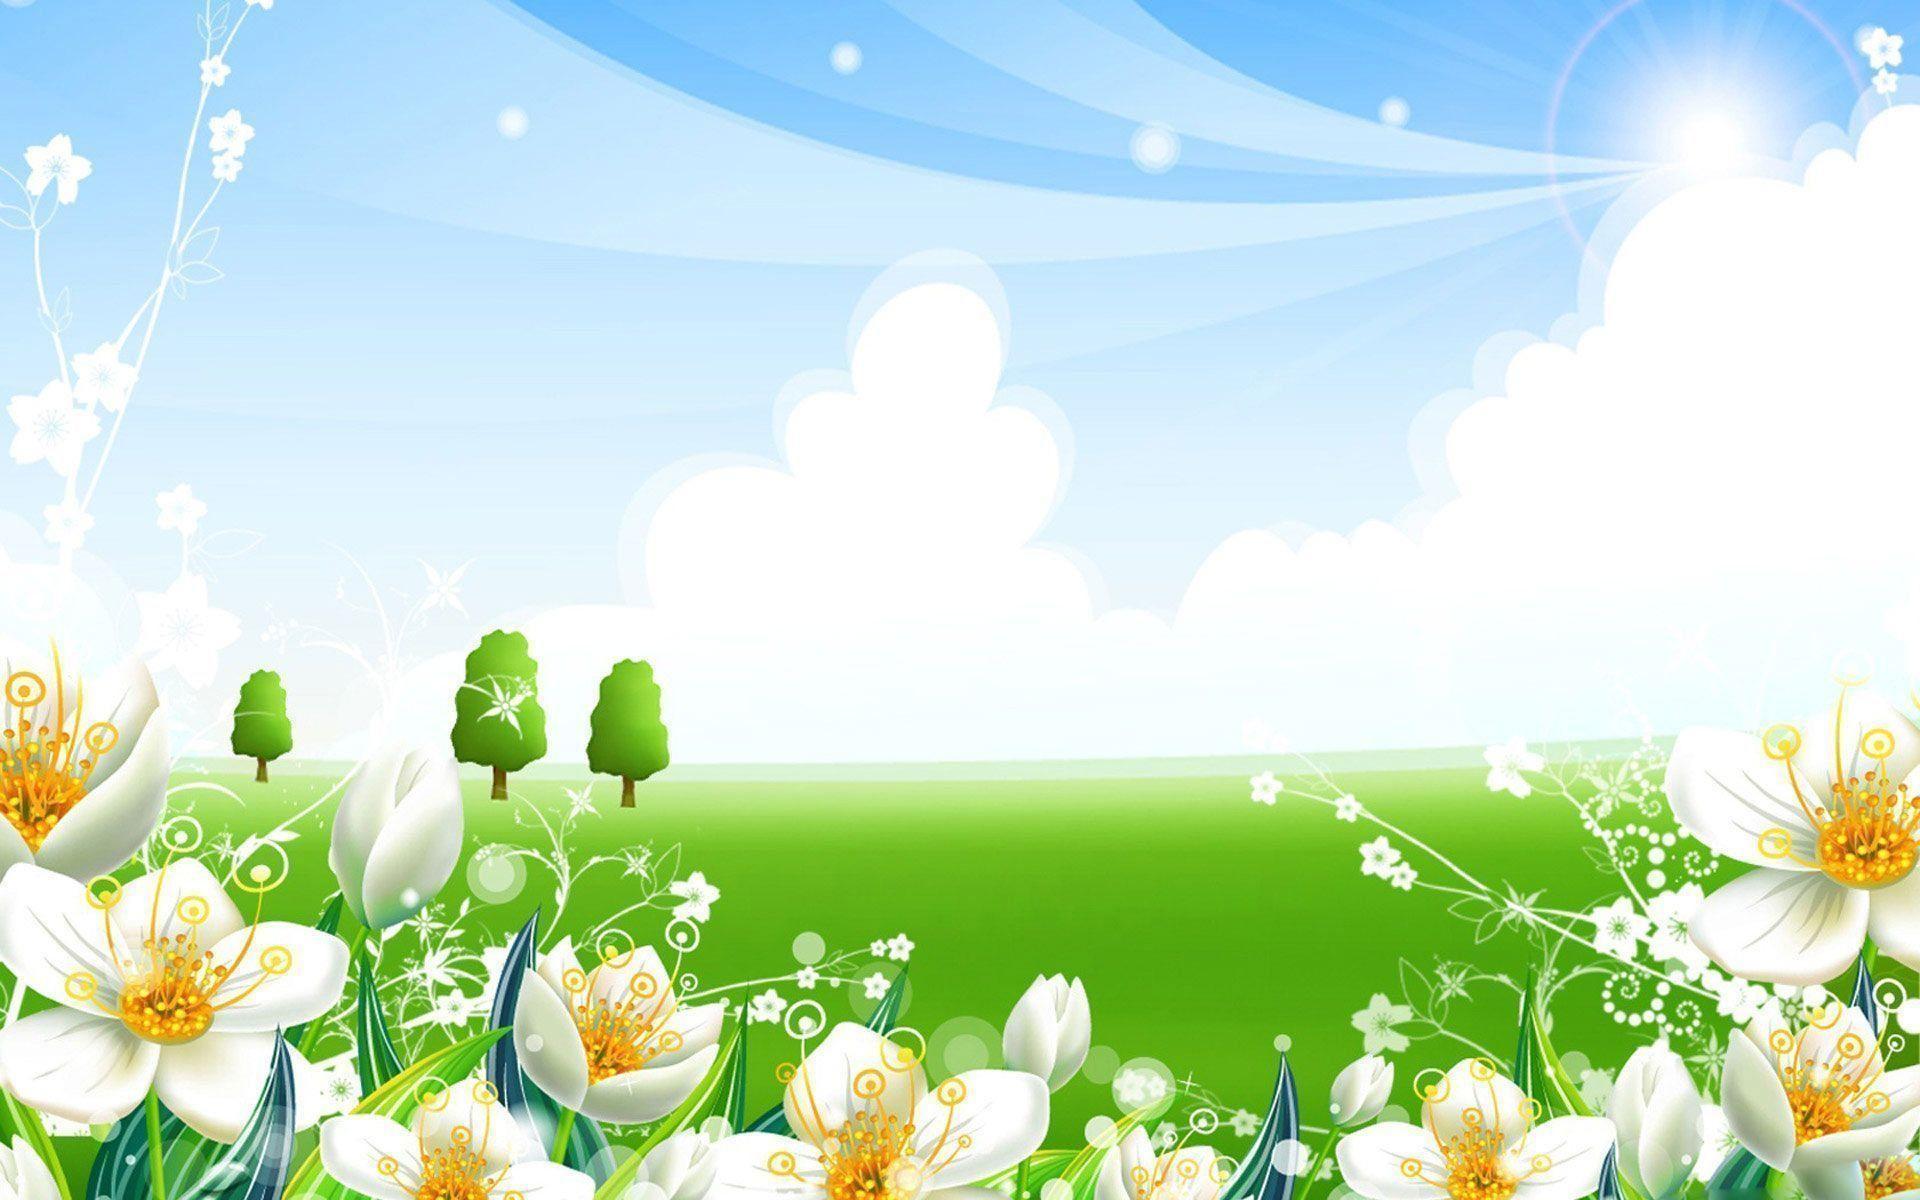 Wallpapers For > Summer Flowers Wallpaper Desktop